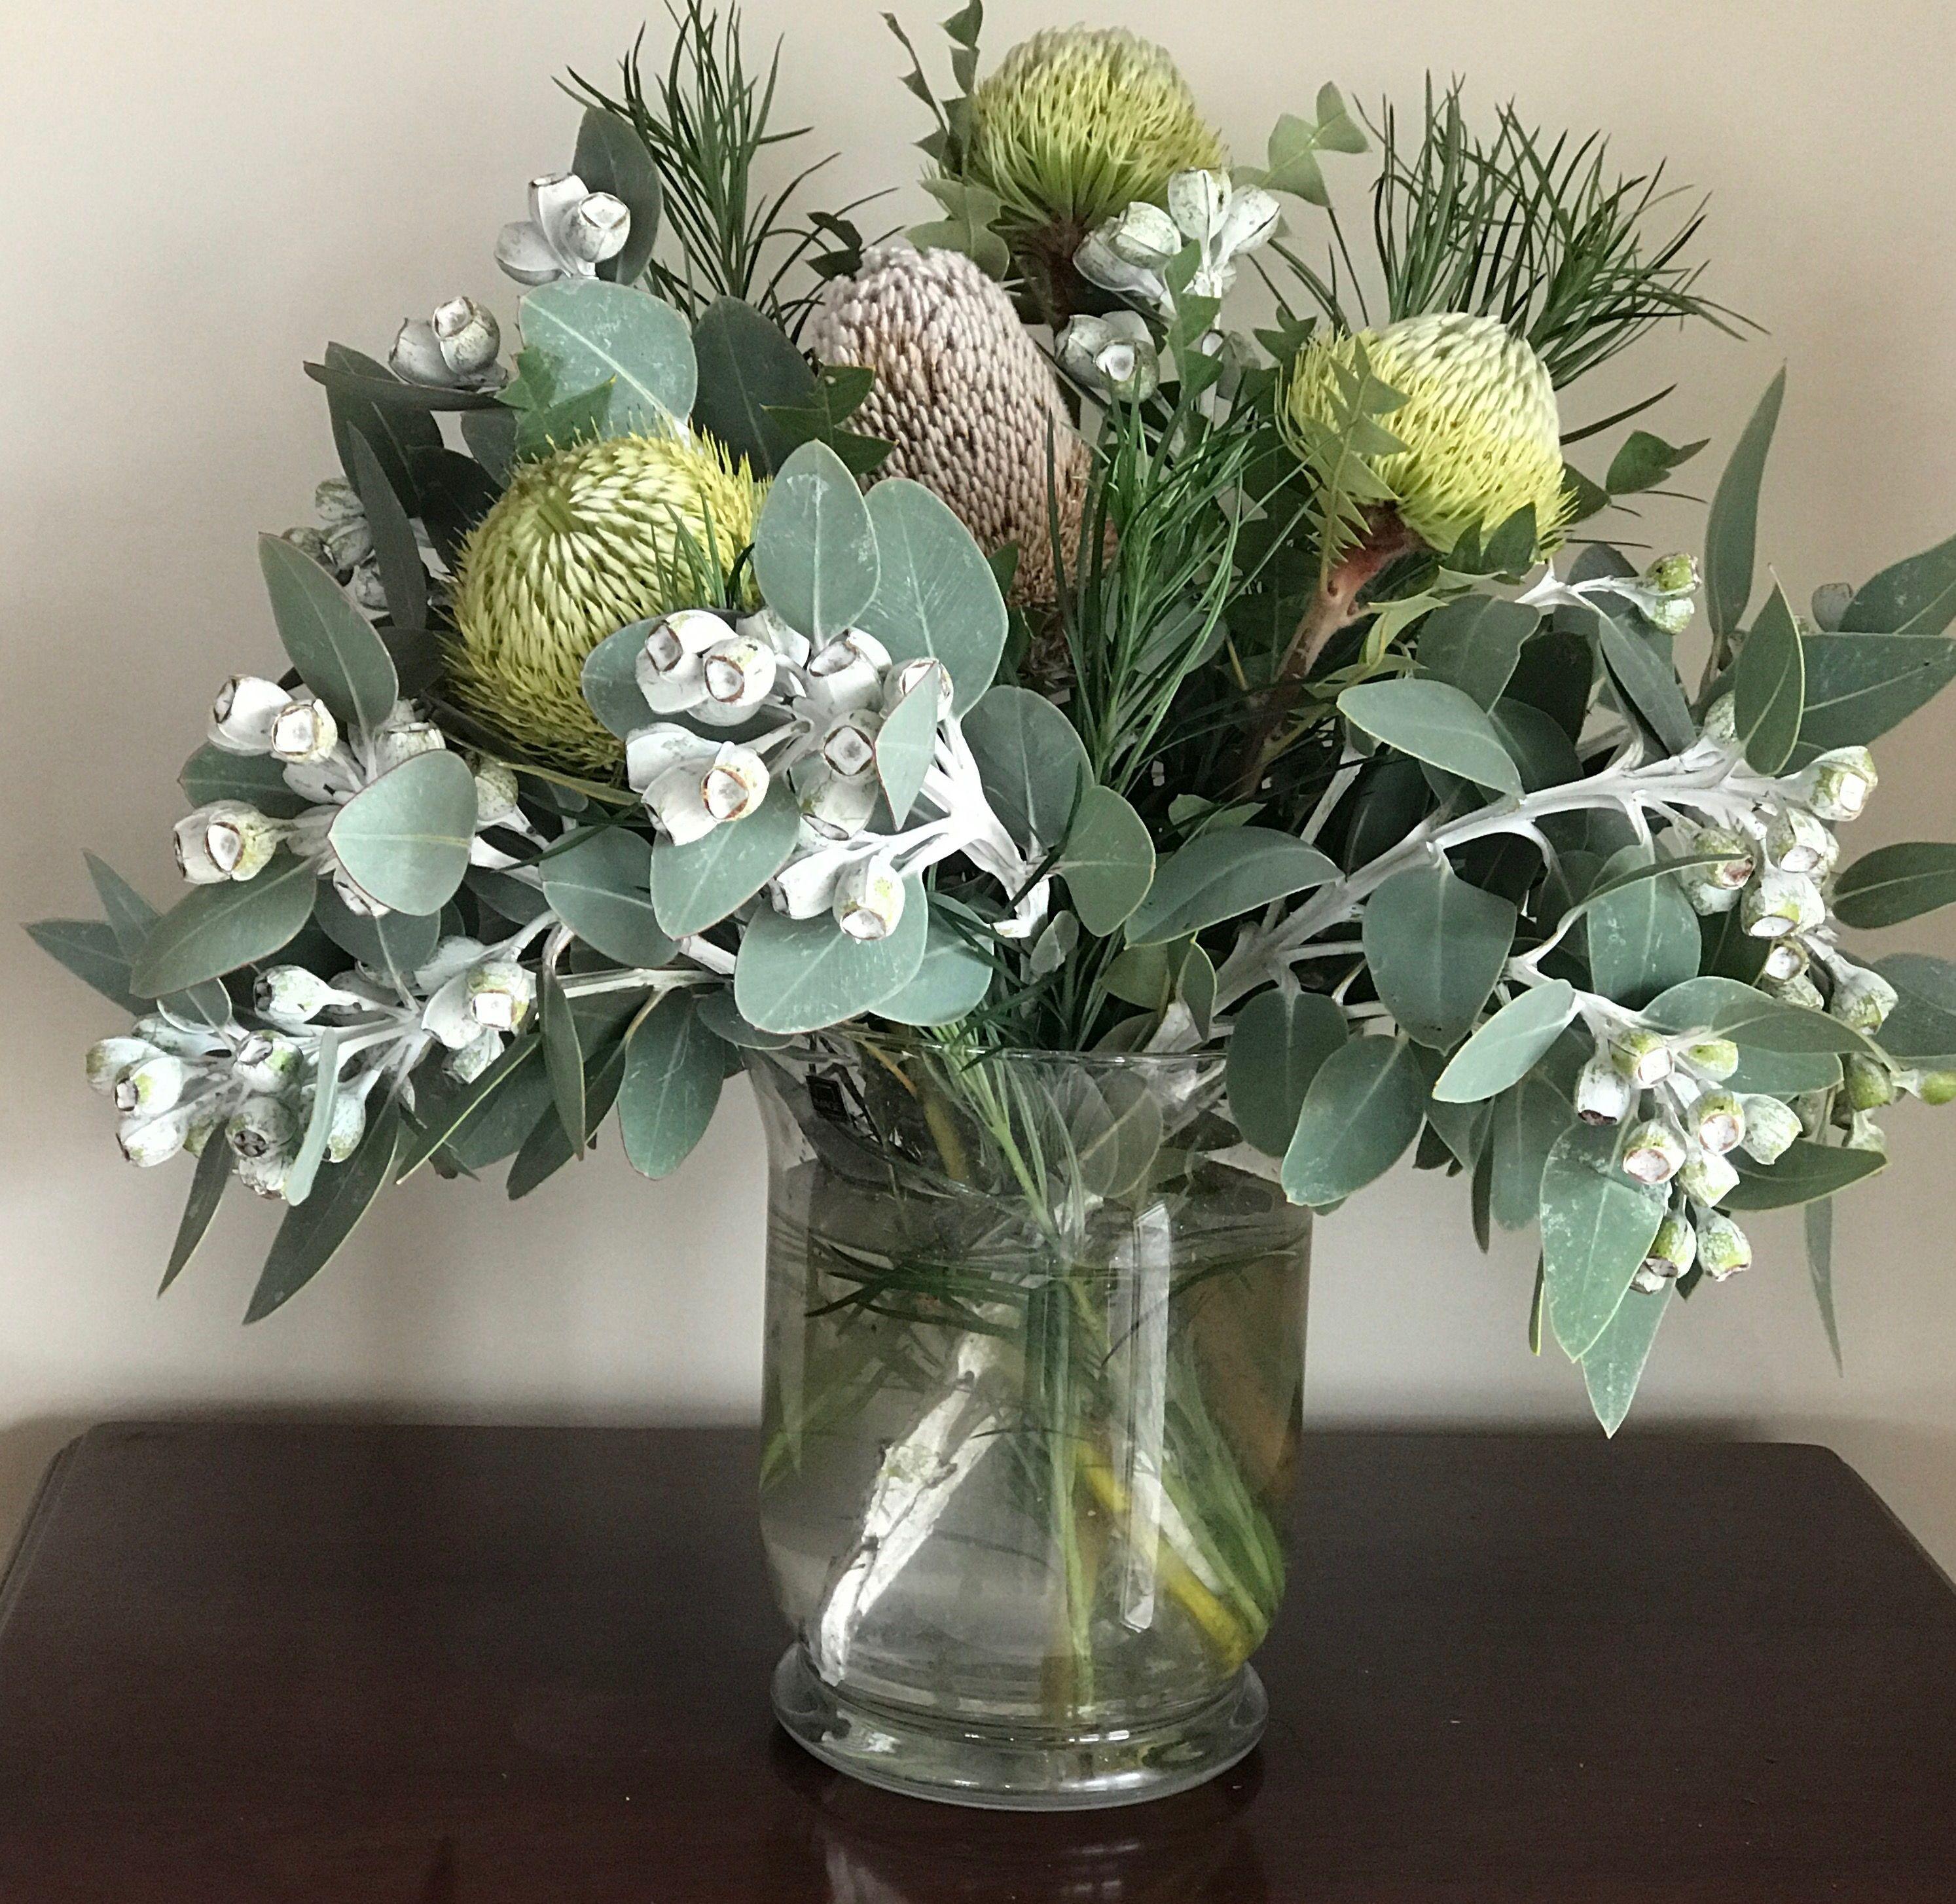 Eucalyptus Tetragona Gumnuts And Foliage With Banksia Baxteri Australian Native Flowers Australian Flowers Flower Arrangements